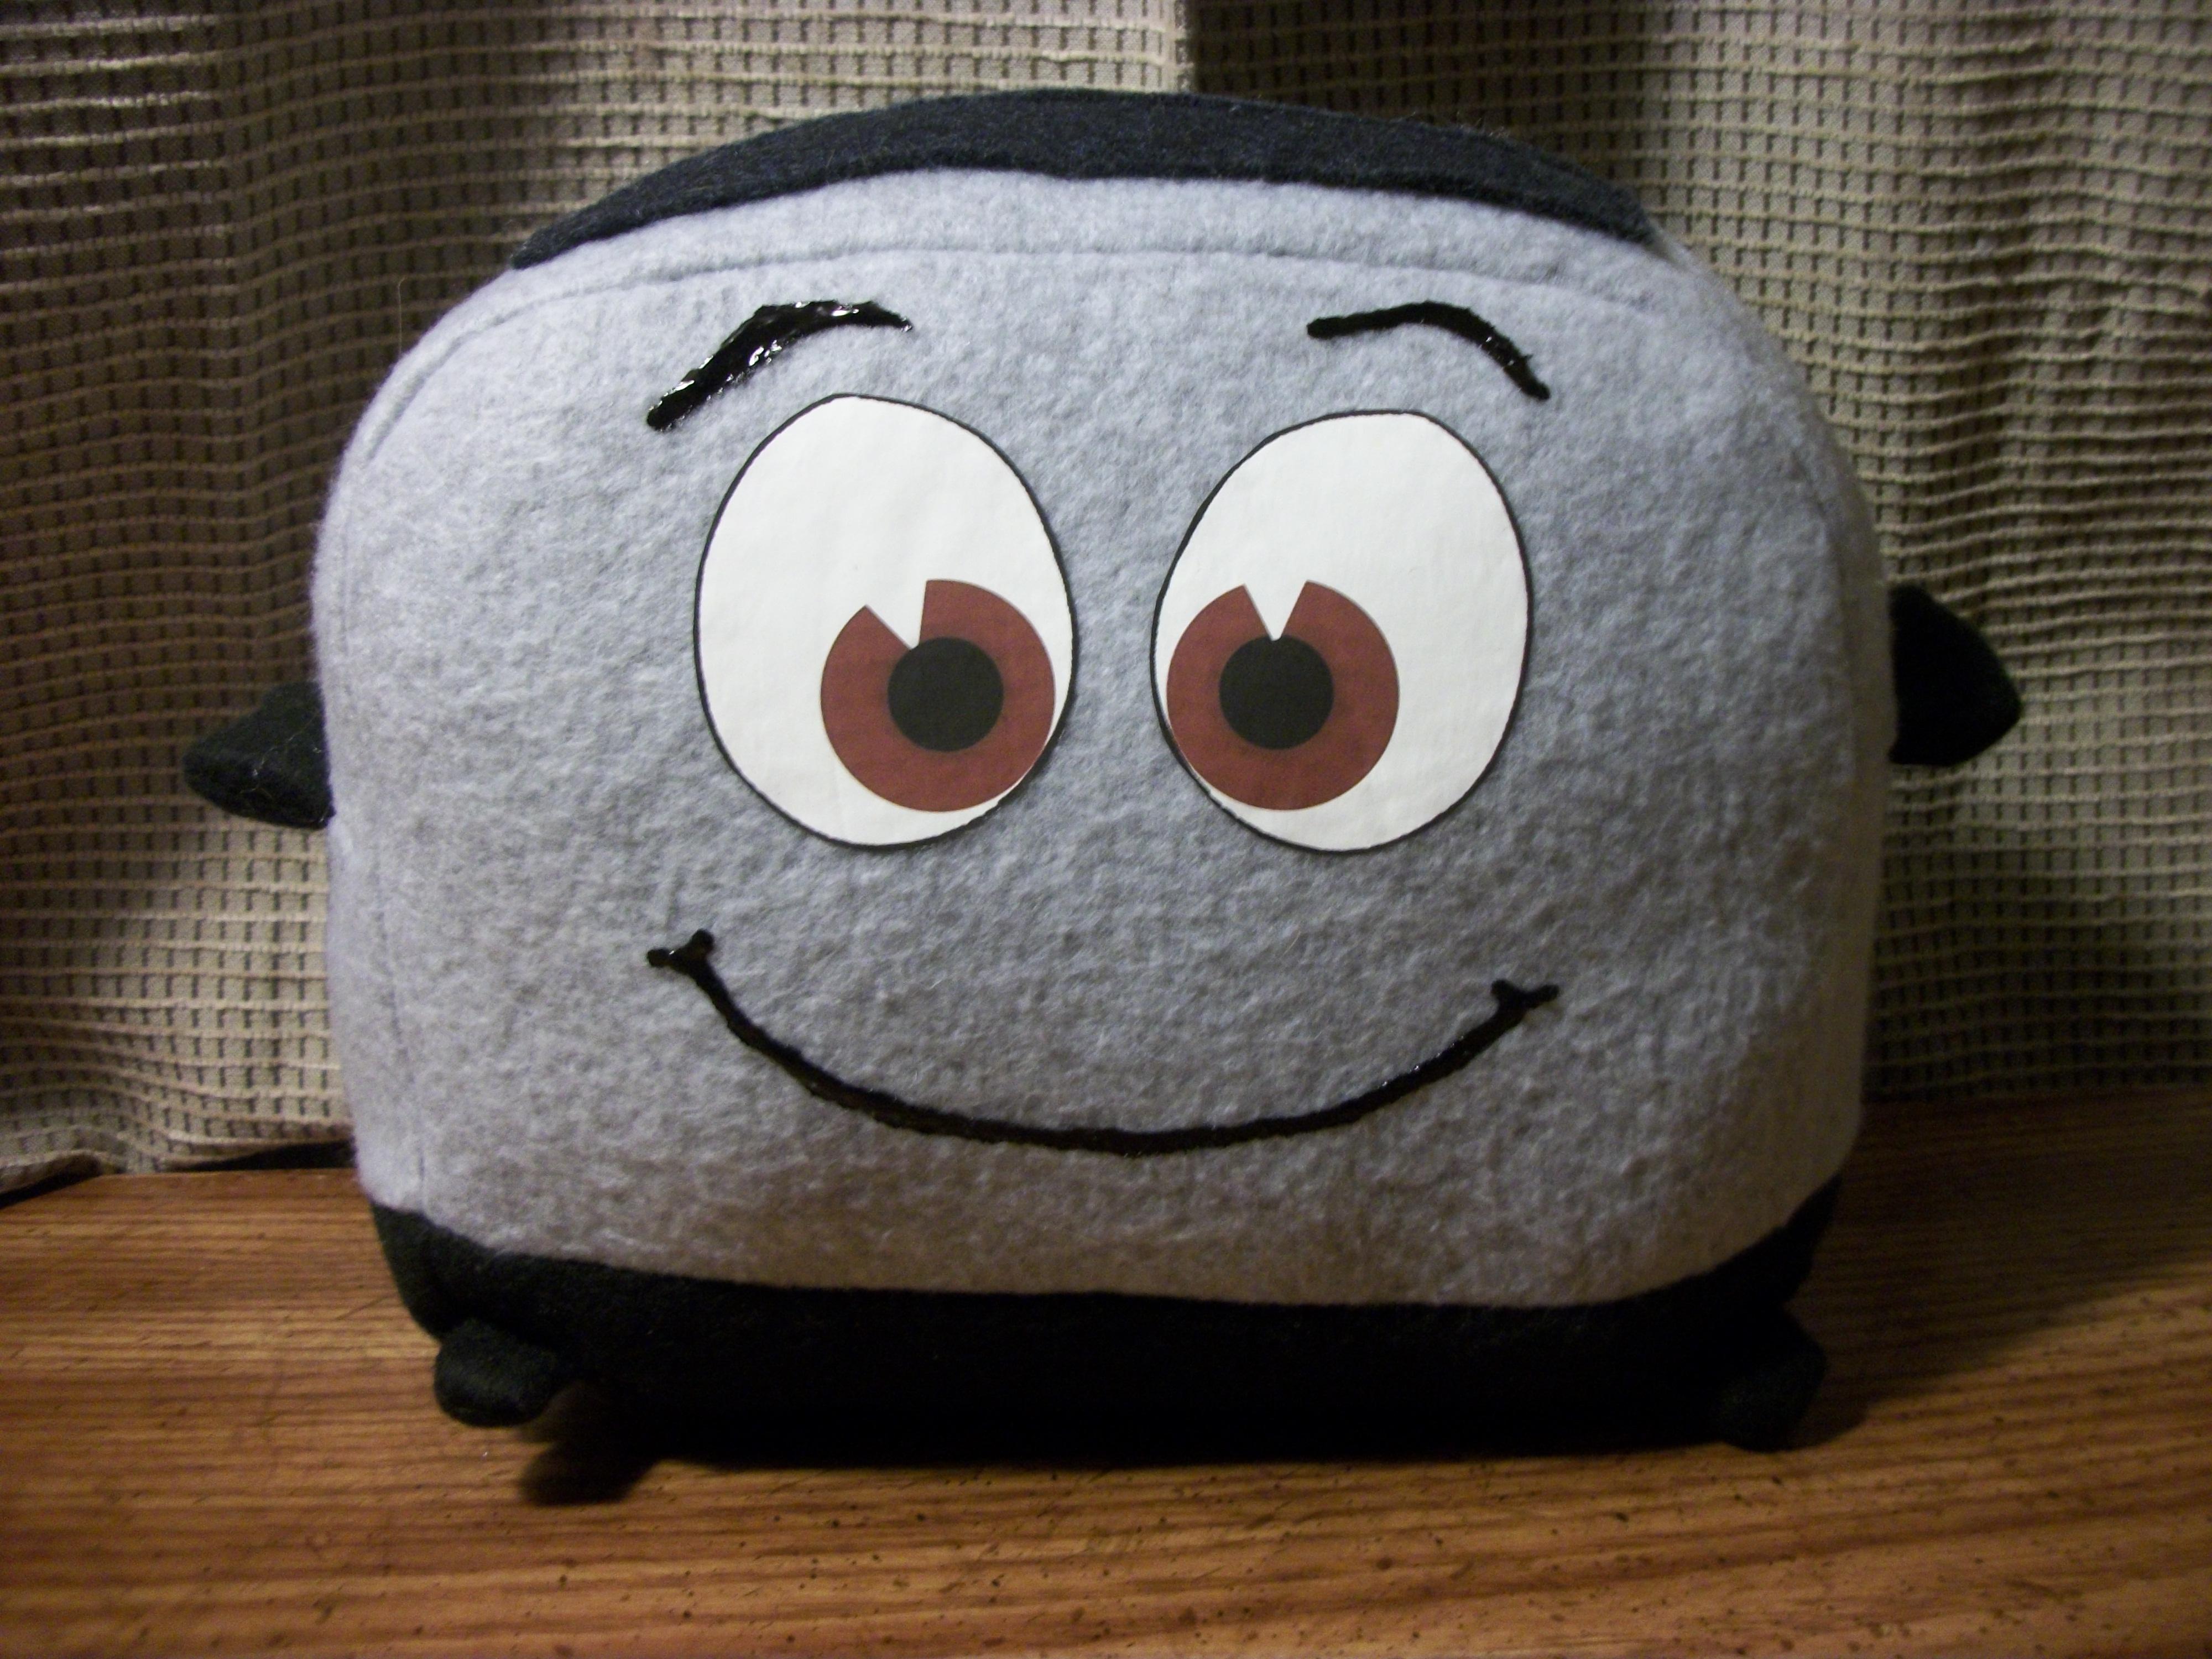 Toaster Toys 24